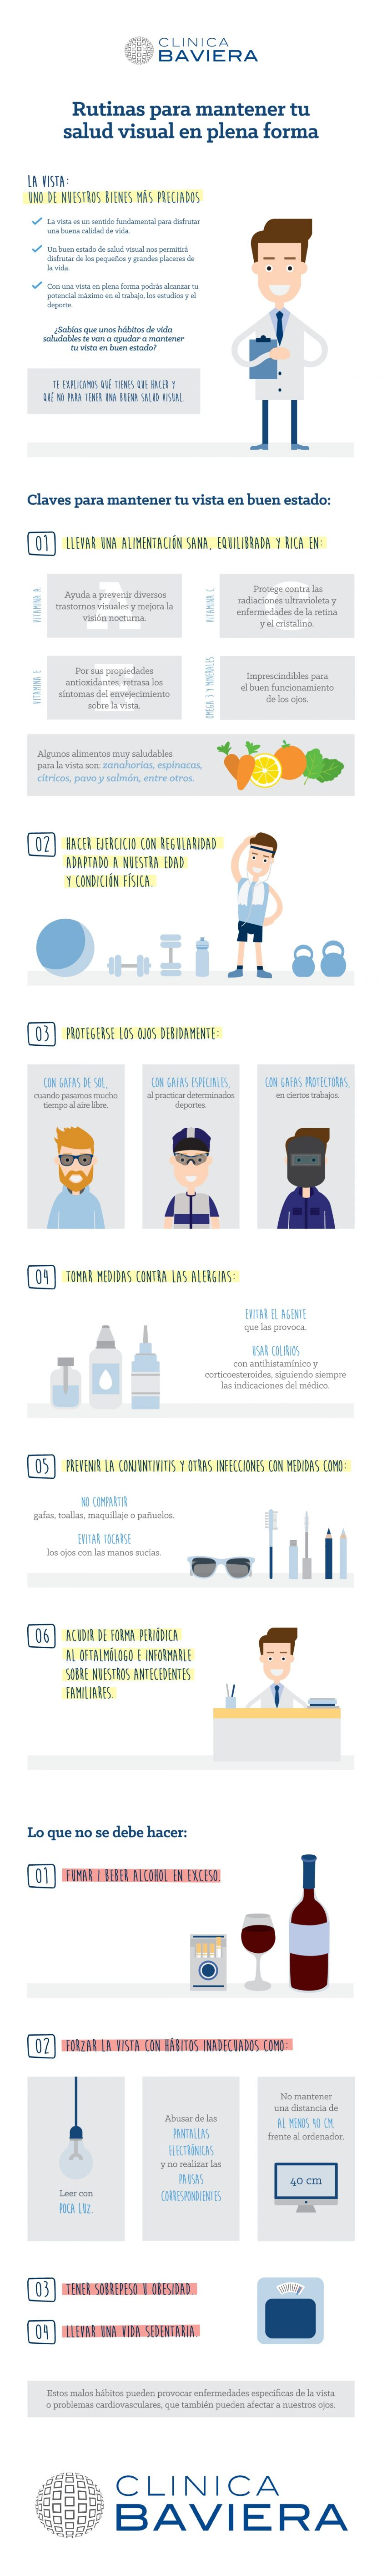 Infografia para mantener tu salud visual en plena forma